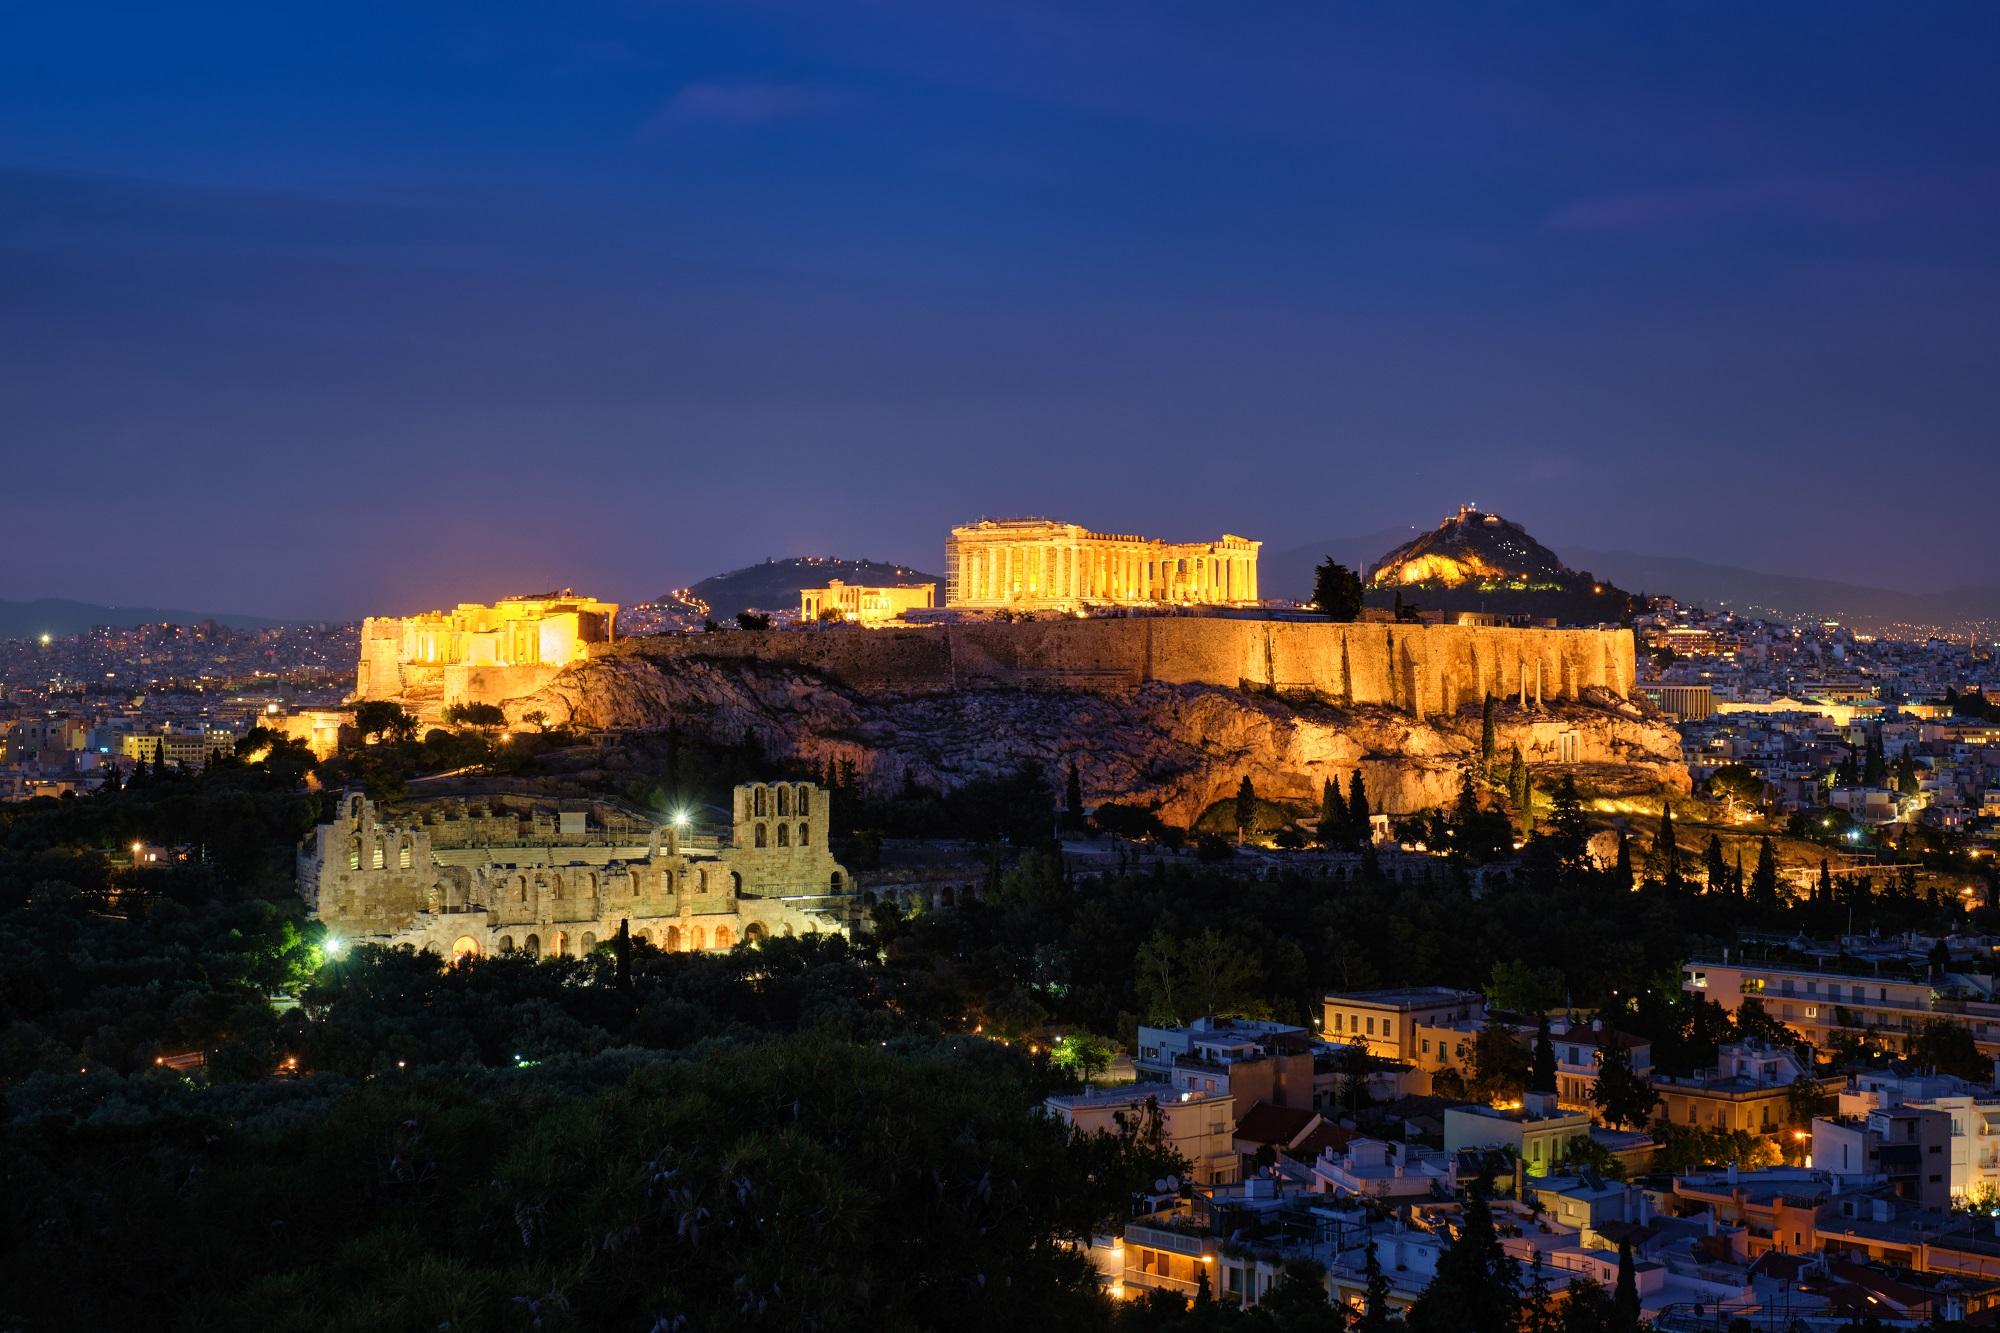 Iconic Parthenon Temple at the Acropolis of Athens, Greece